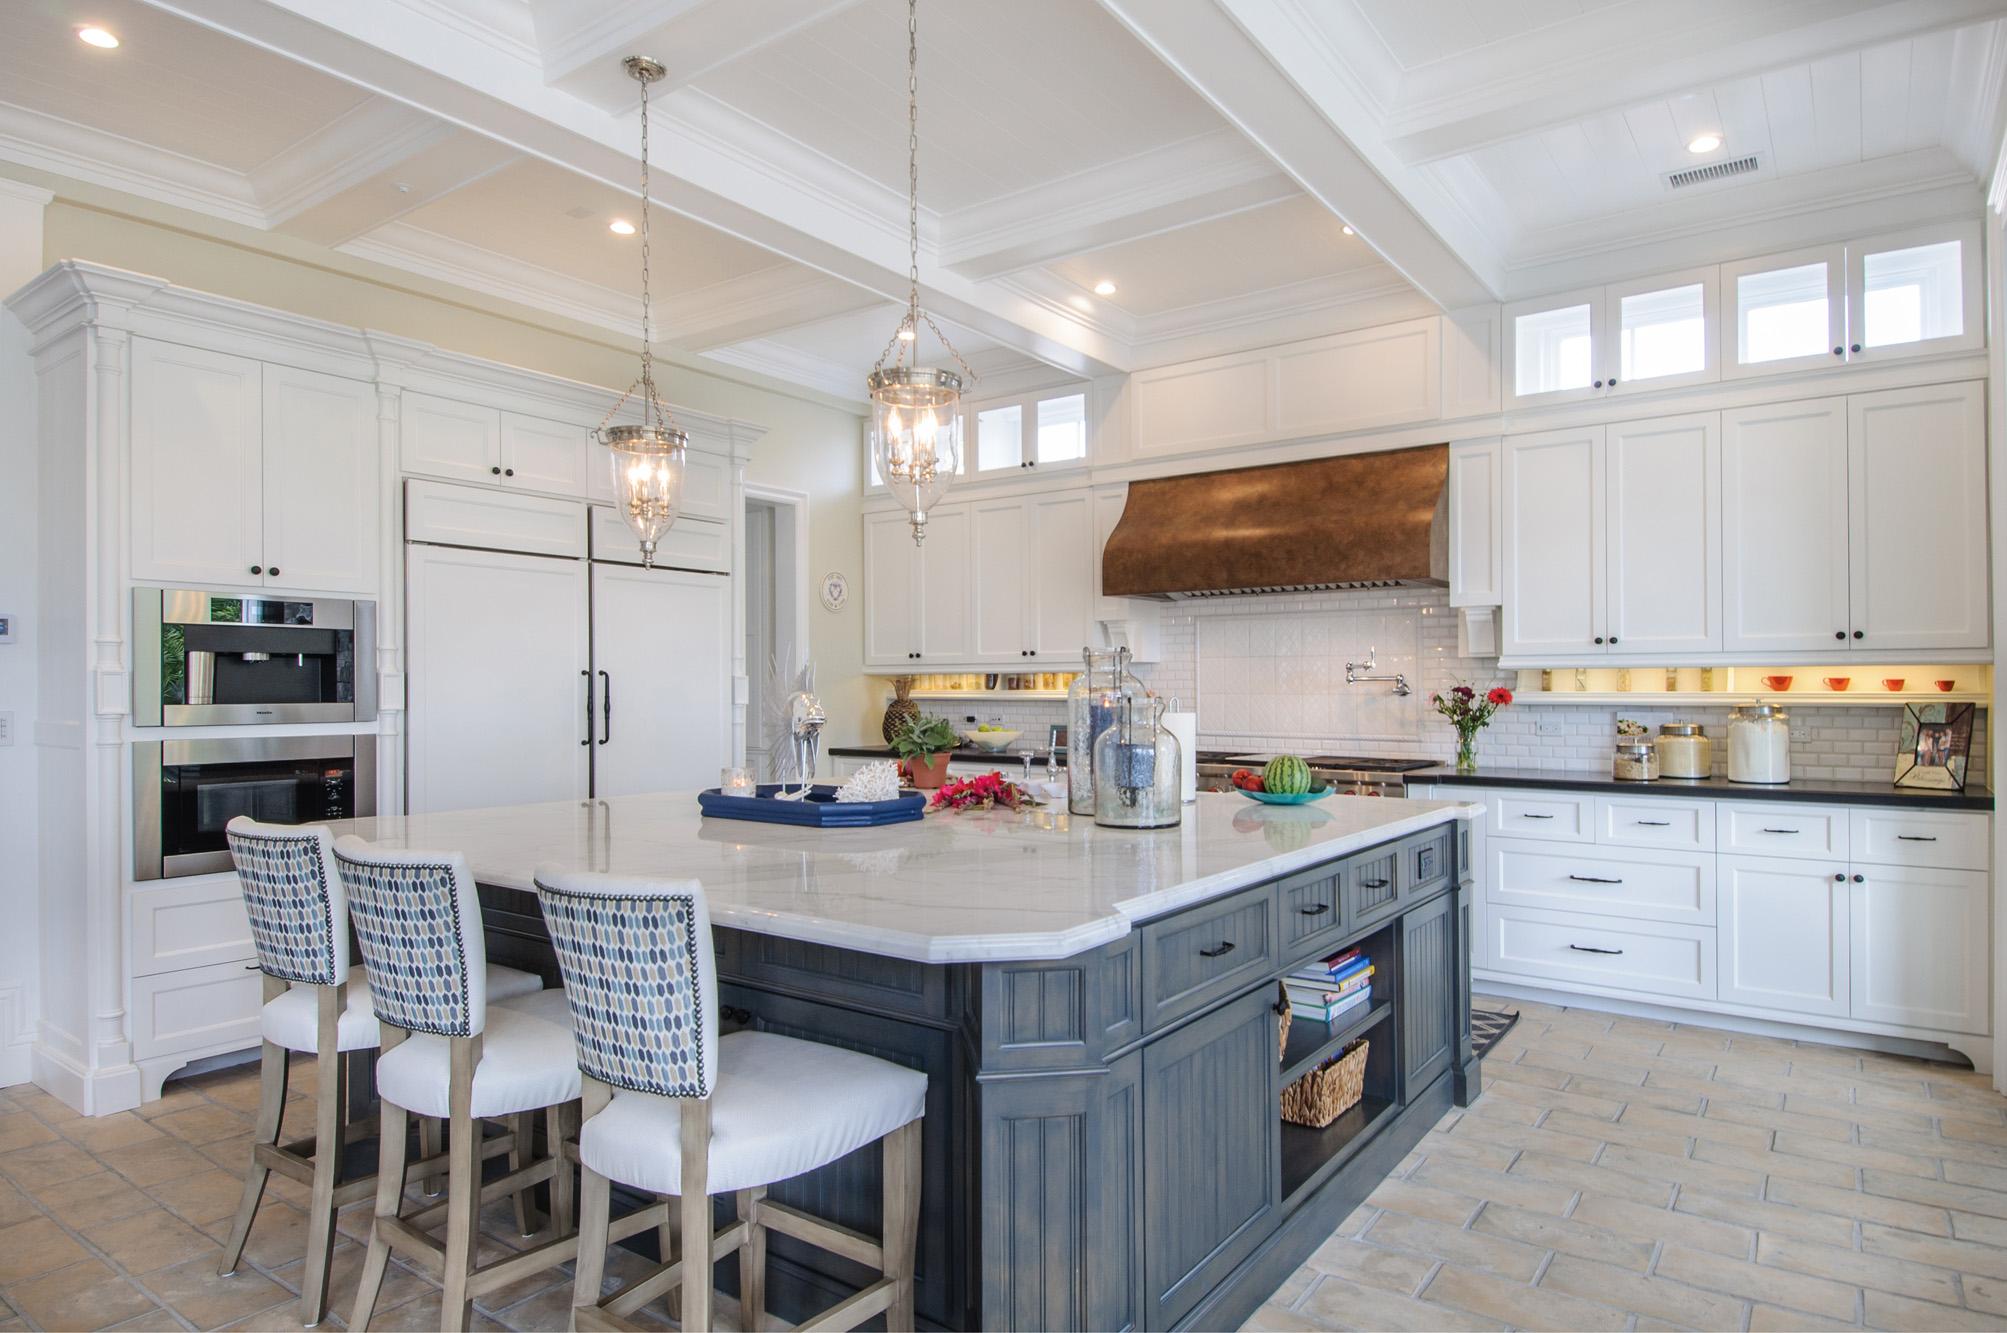 kitchen - marble island - barstools.jpg